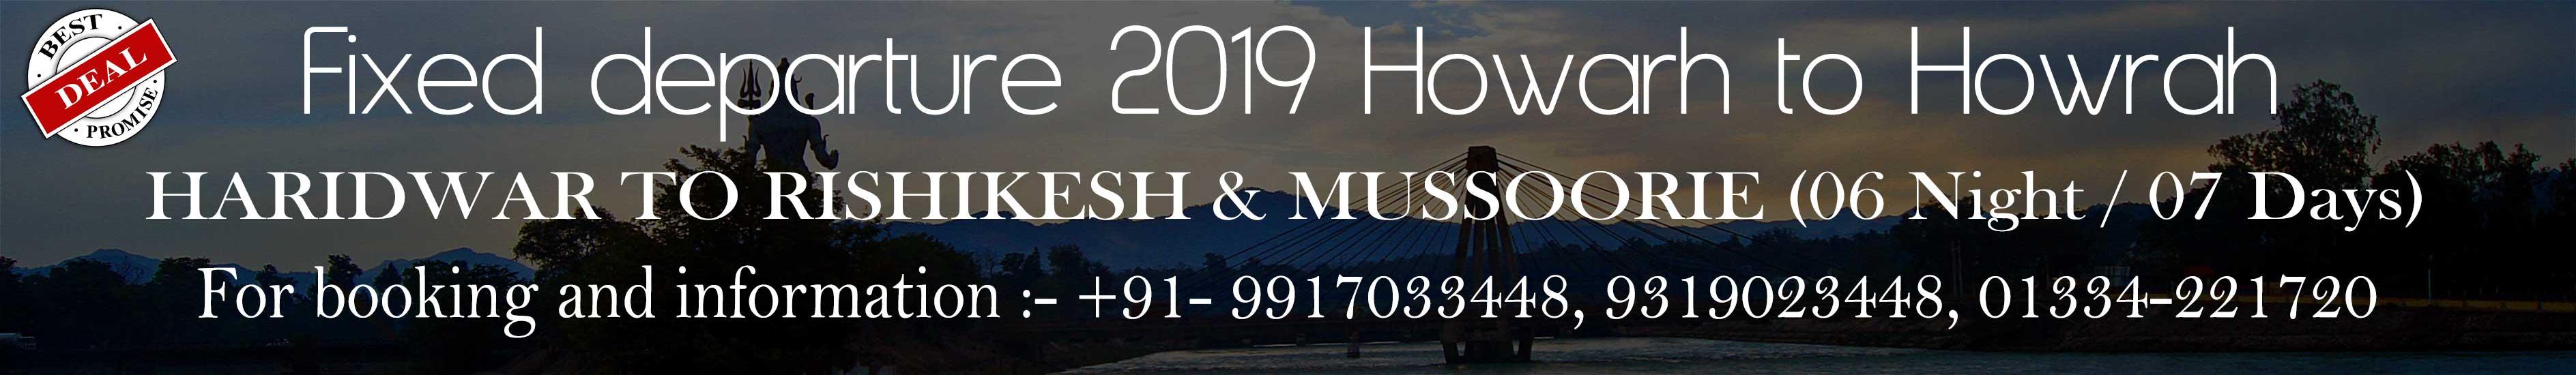 Haridwar Rishikesh Mussoorie Tour Package from Howrah to Howrah